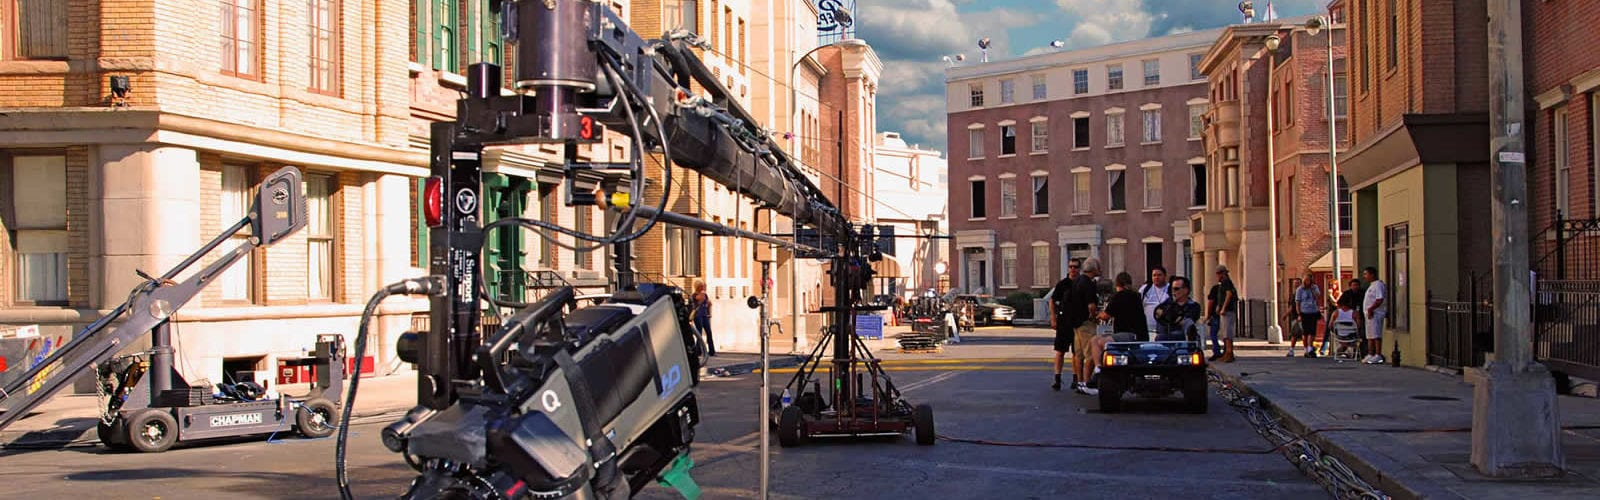 visite-studios-paramount-hollywood-cinema-films-los-angeles-une